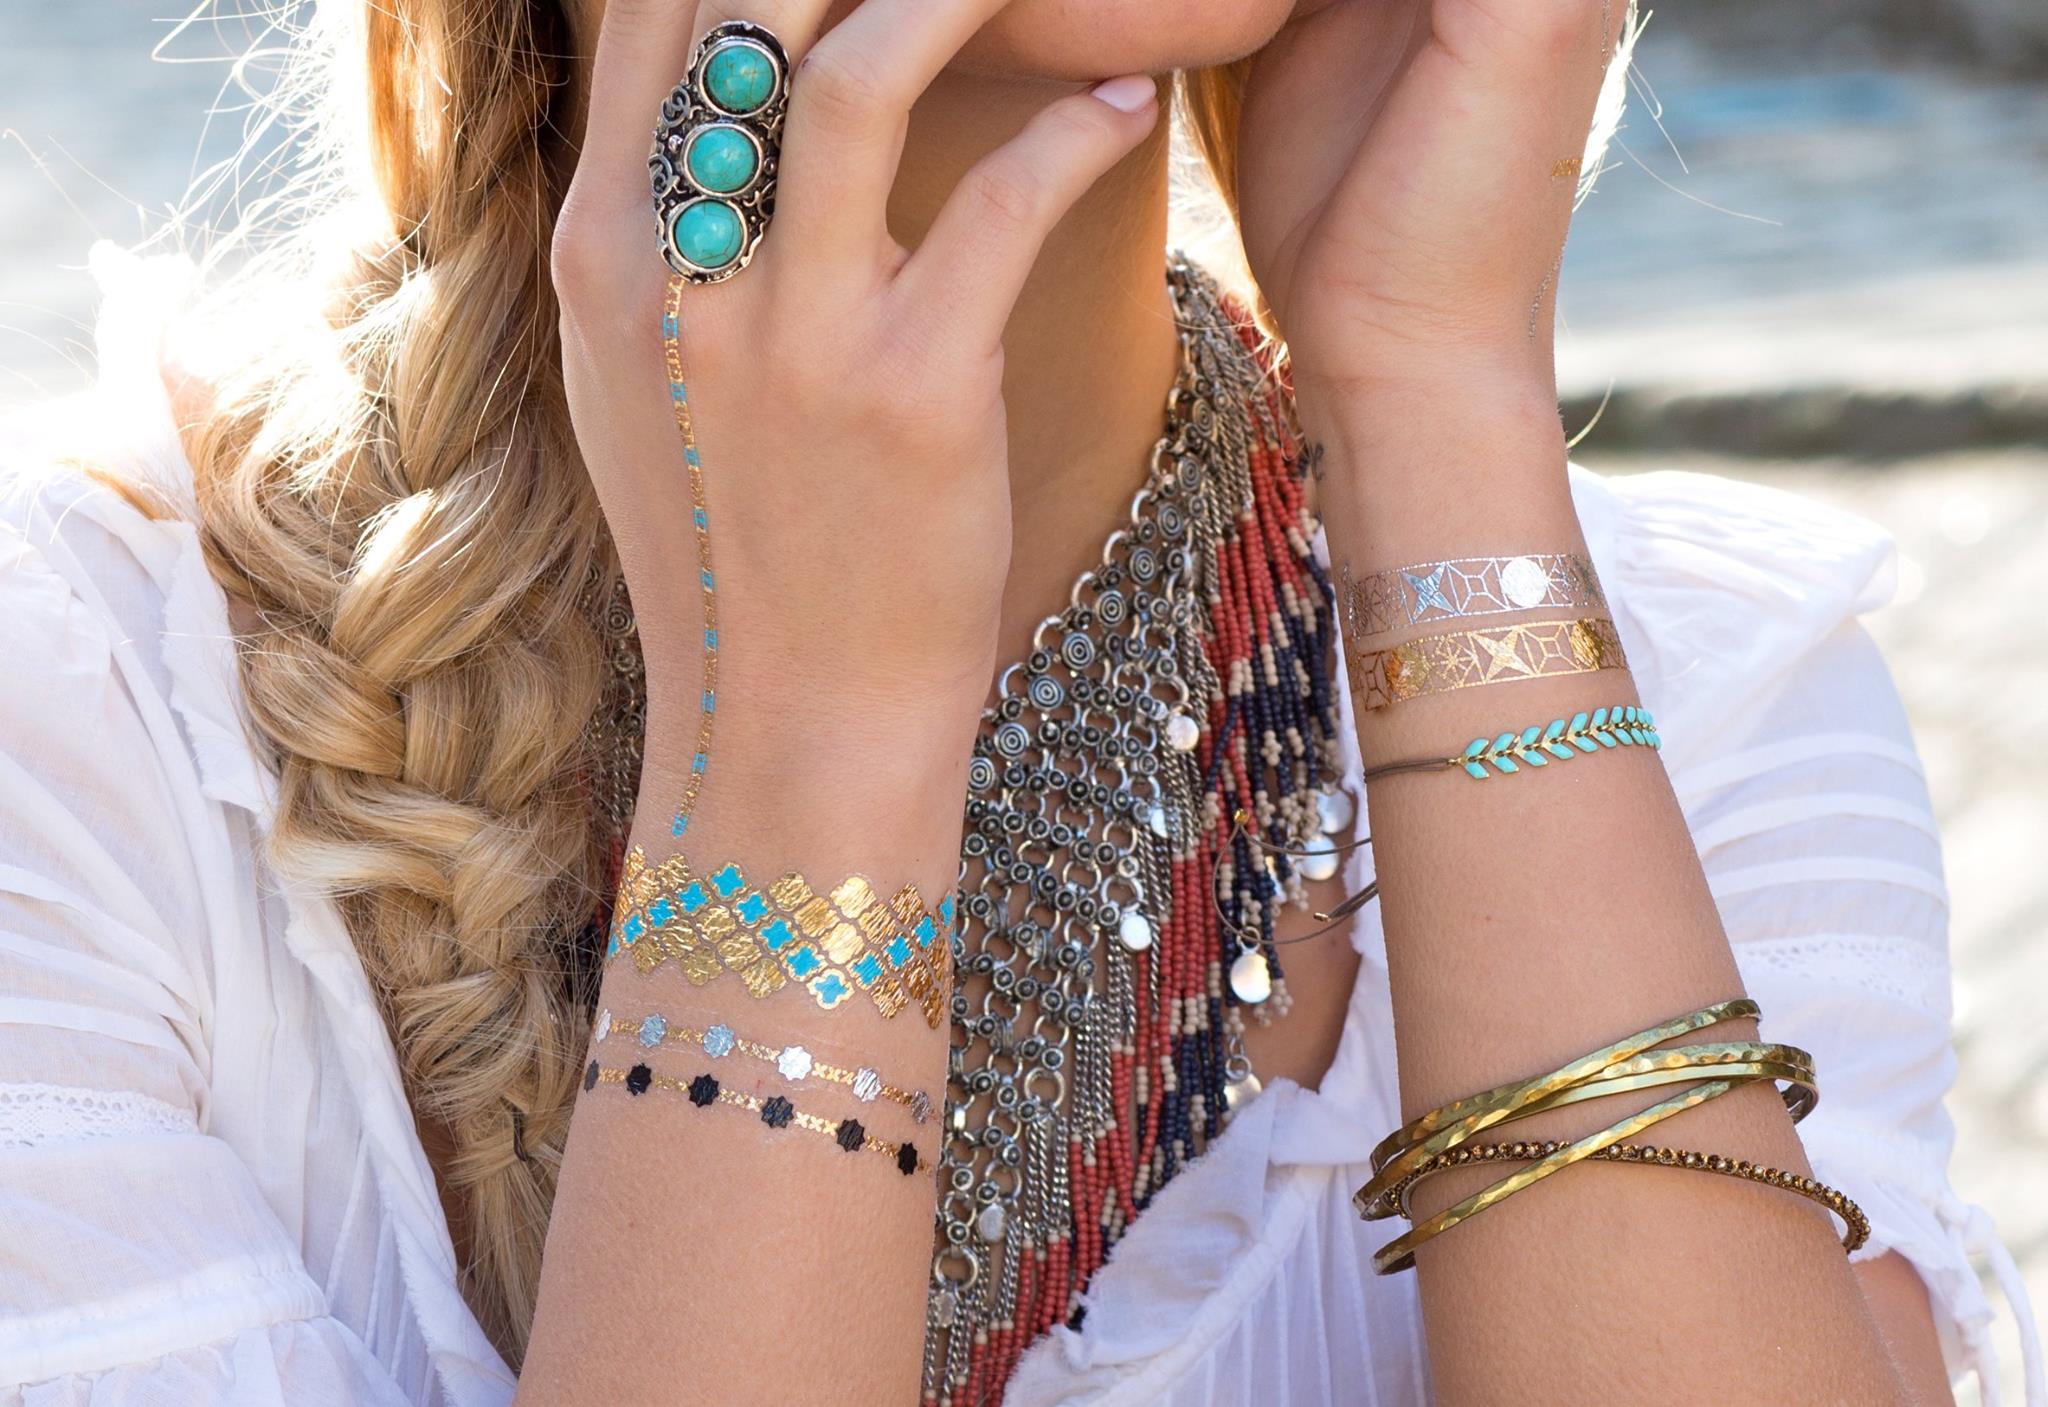 tatouage-ephemere-bijou-peau-jewelry-tattoo-arabesque-dore-concours-blog-voyage-beaute